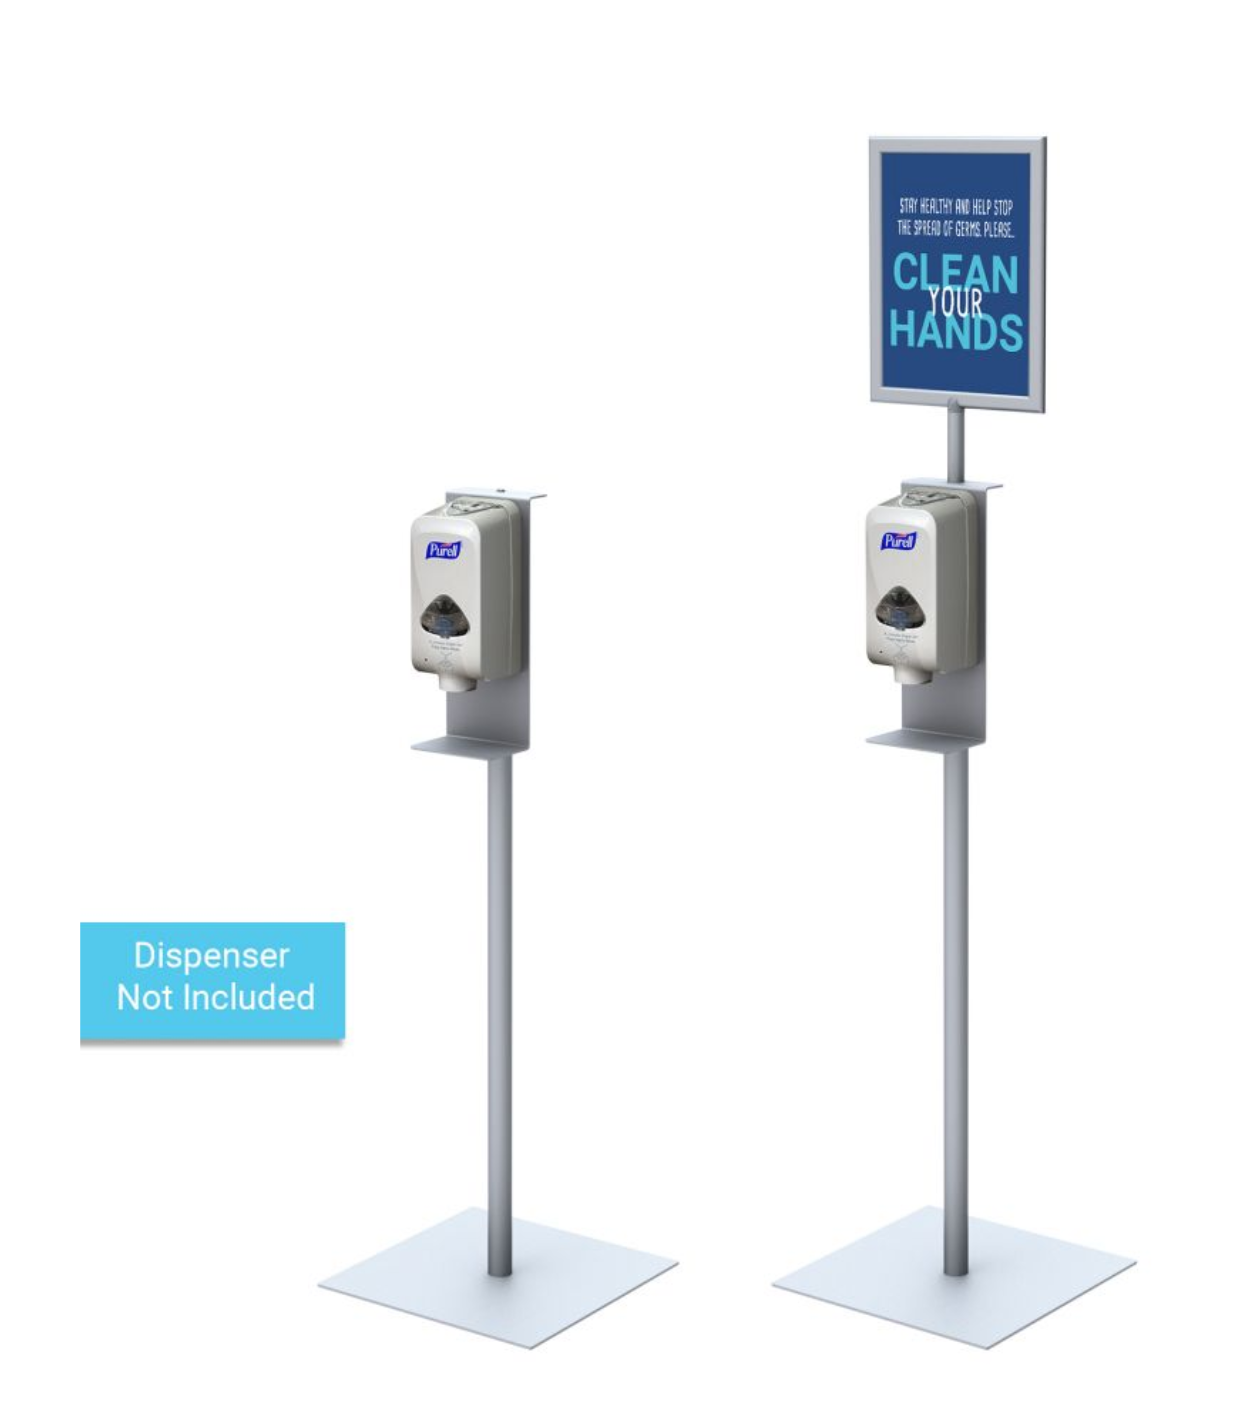 Automatic Hand Sanitizer Pump Dispenser